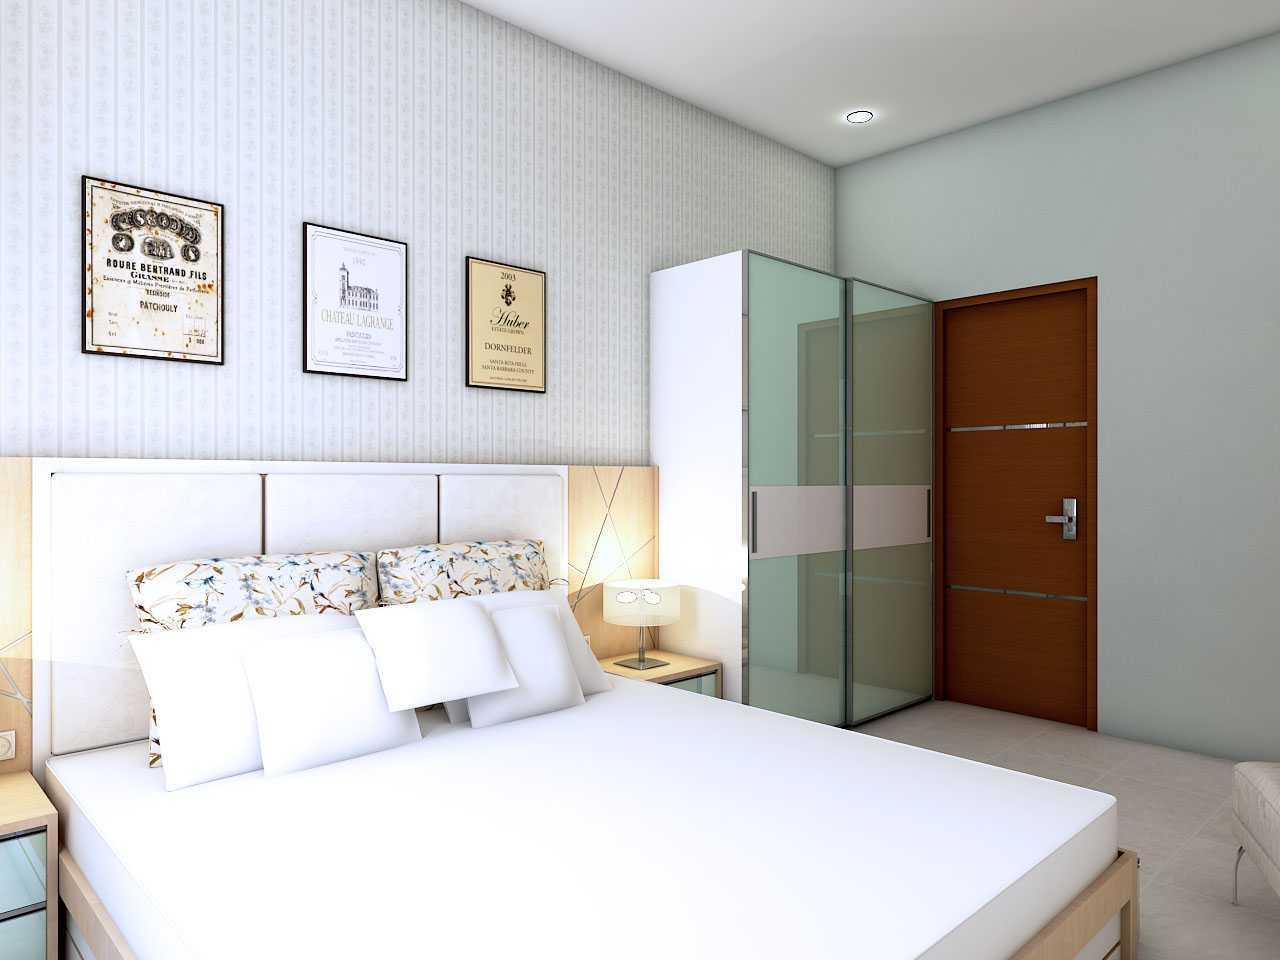 interior bedroom design furniture. Arteta Interior Design \u0026 Furniture Master Bed Room Modern Minimalis Surakarta, Kota Jawa Bedroom